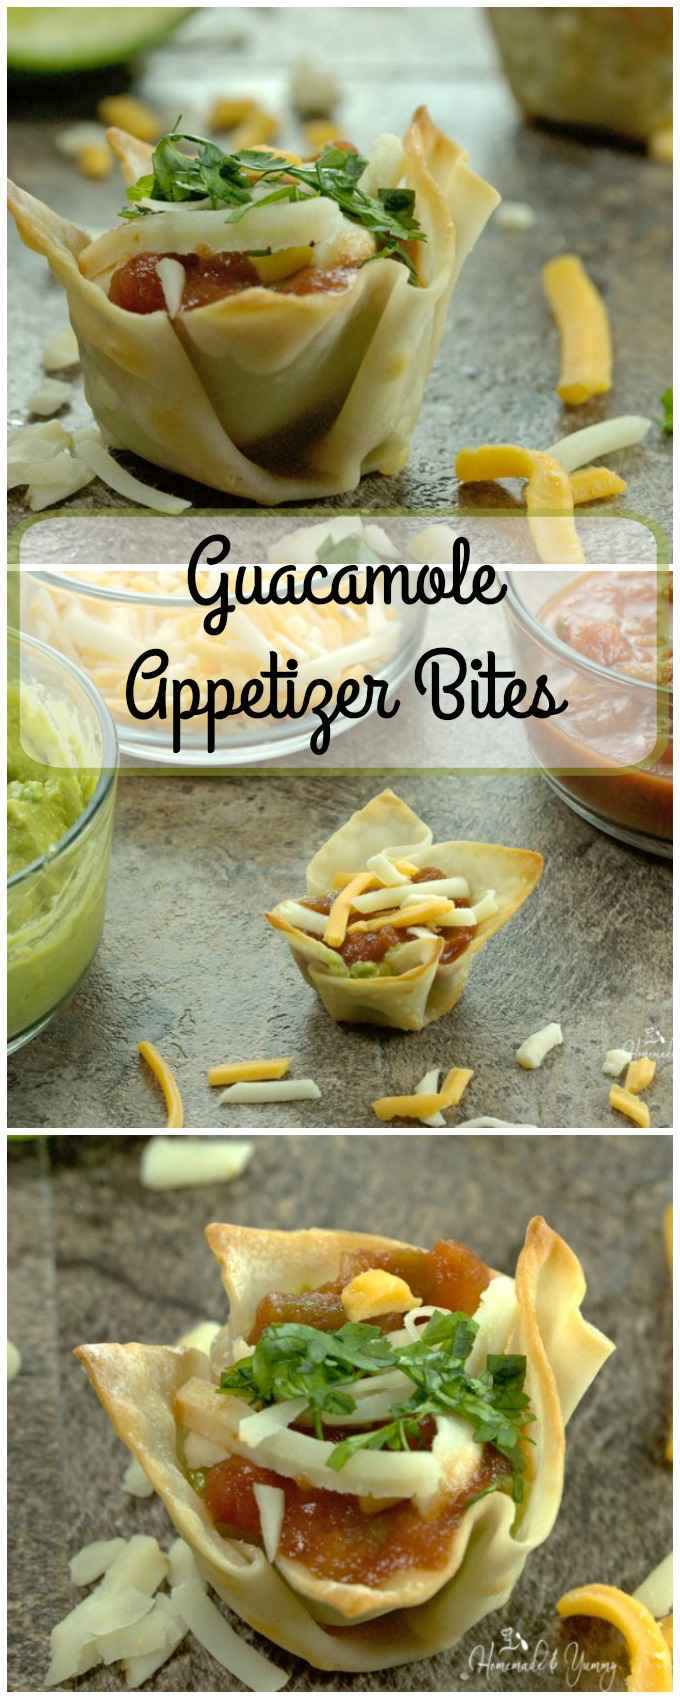 Guacamole Appetizer Bites long pin image.